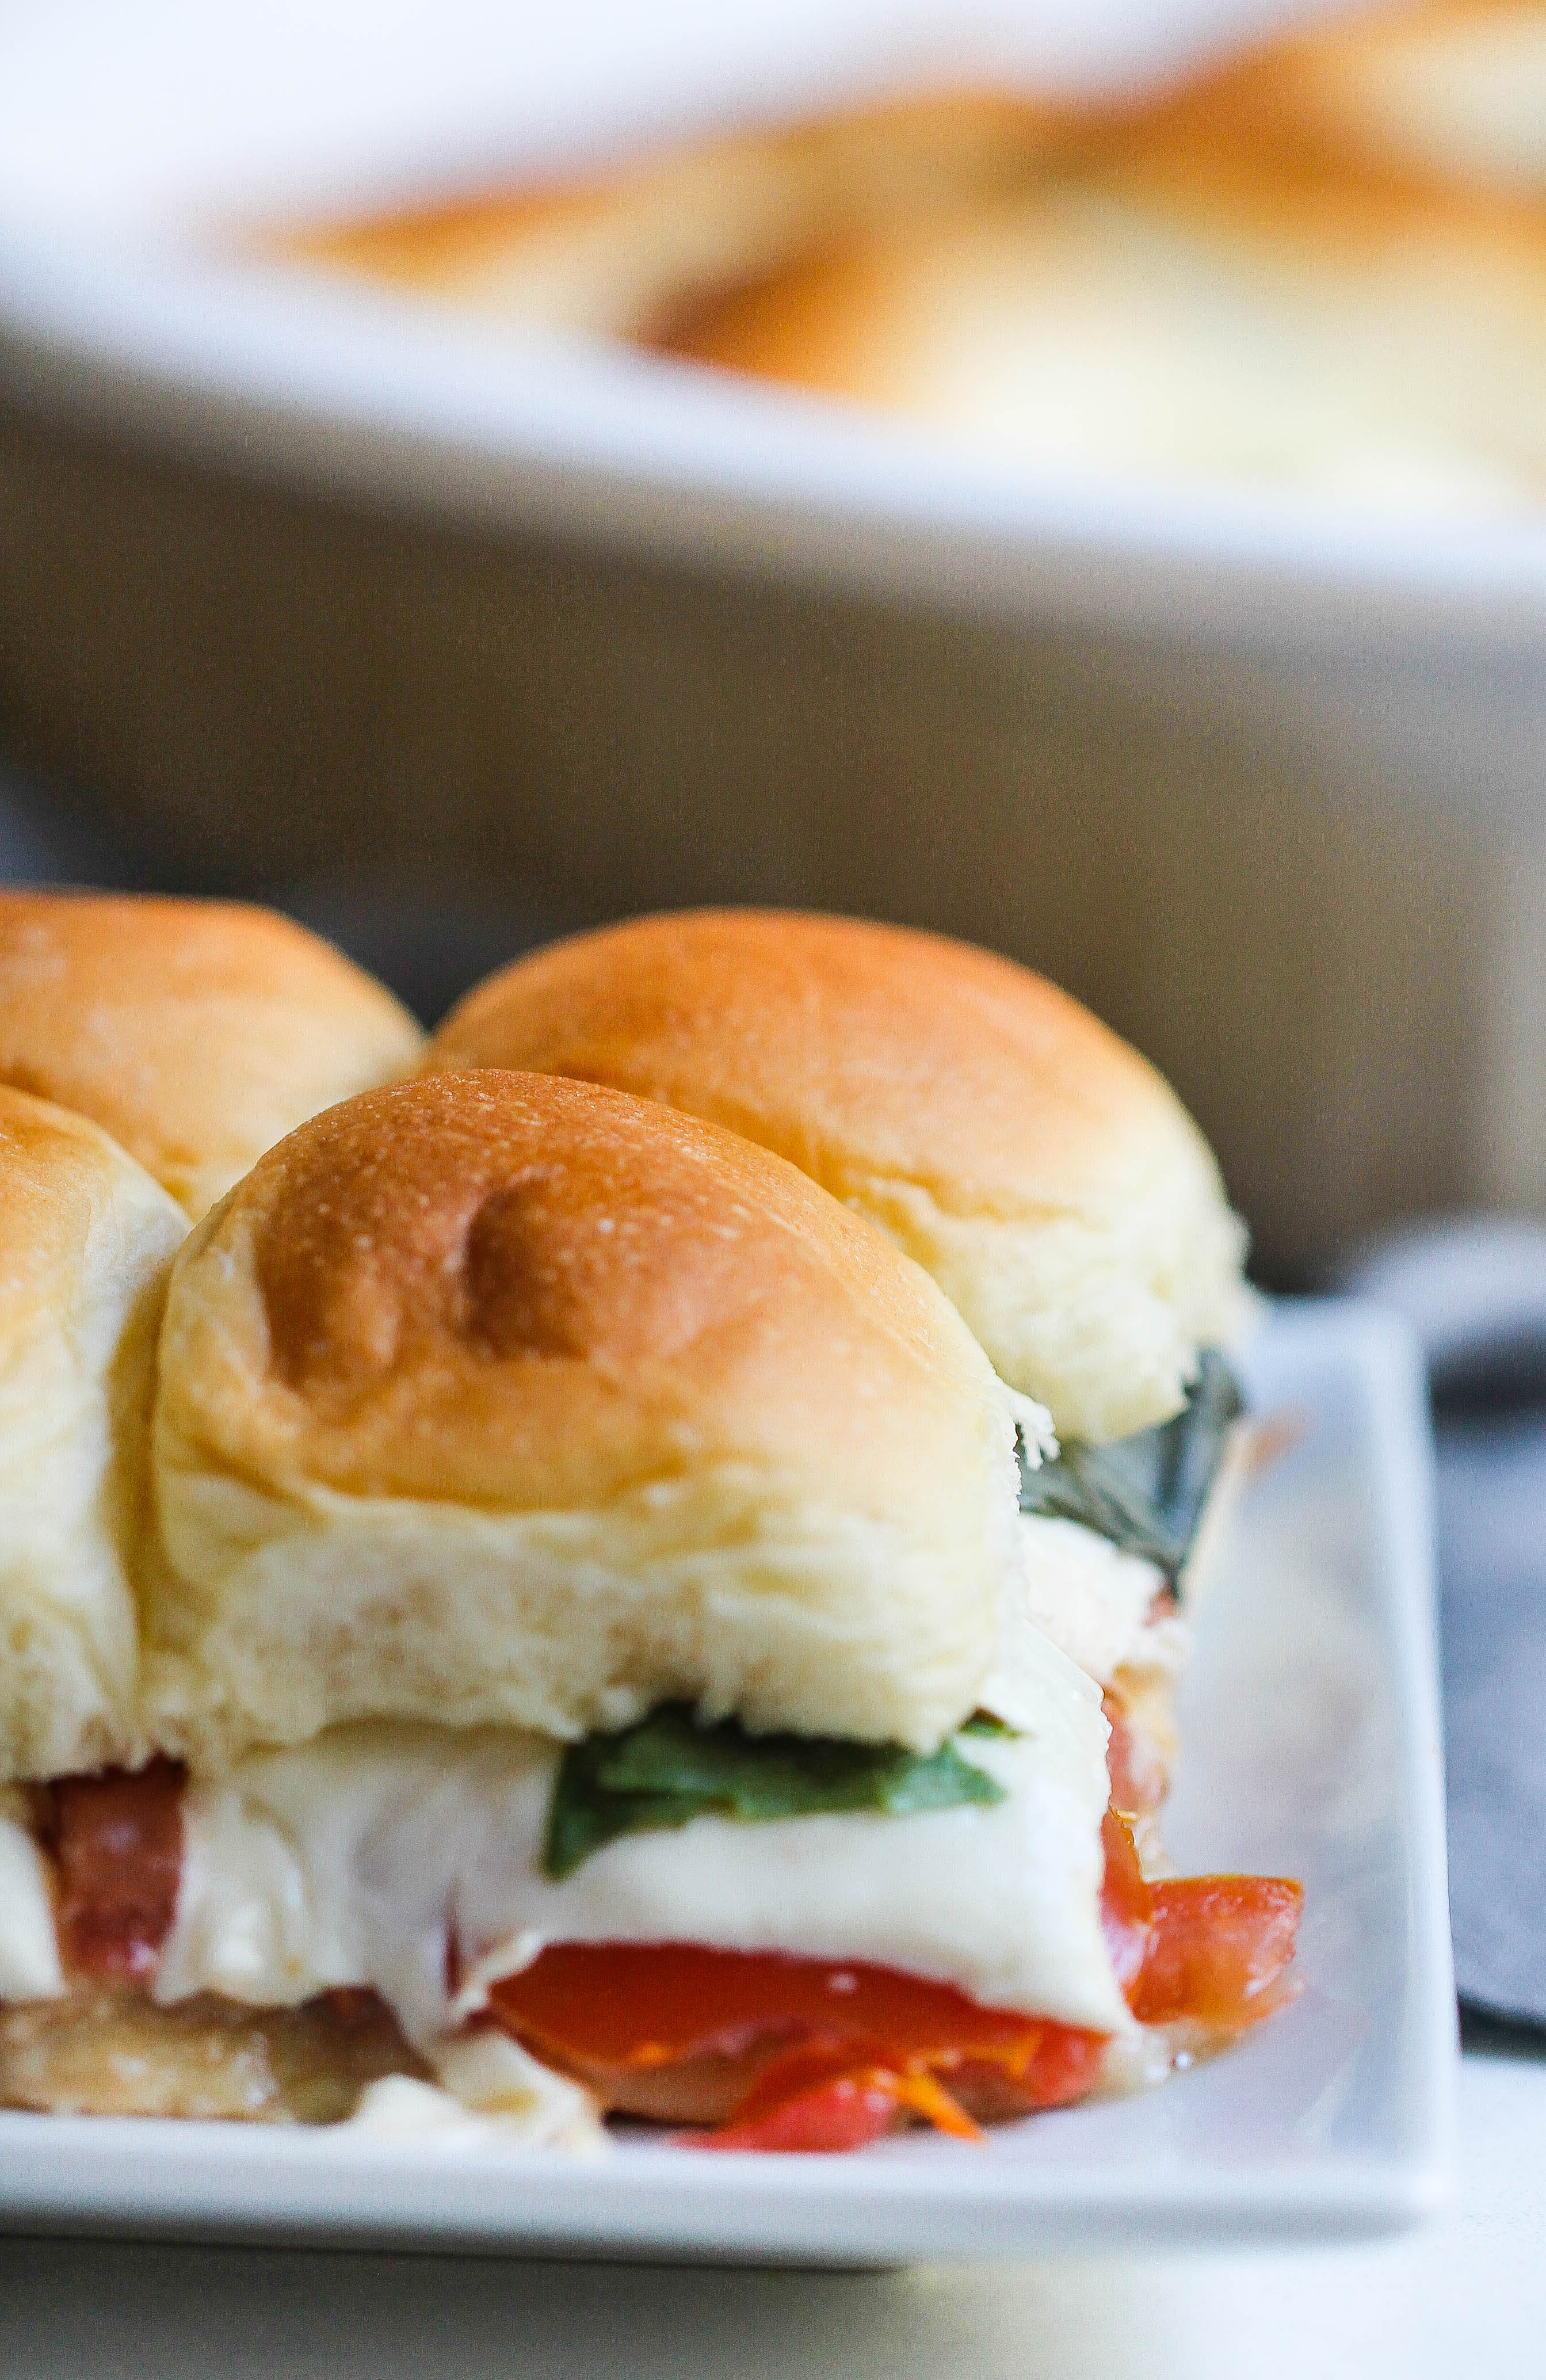 Tomato, Basil, and Cheese Sandwich (Caprese Sandwich)